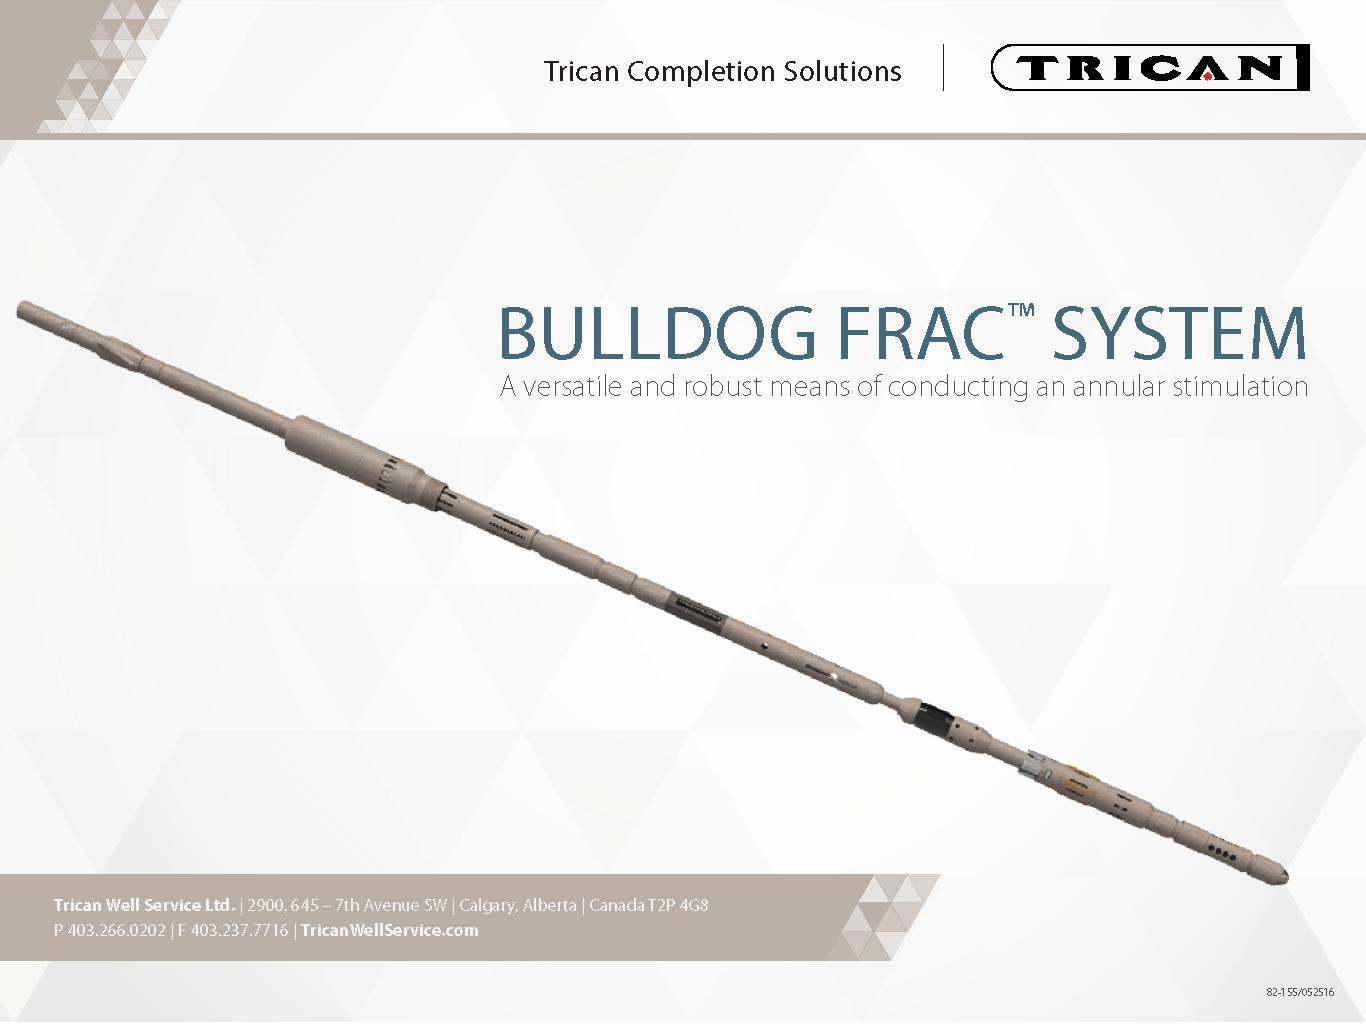 Trican_BullDogFracSystem_Presentation_Page_01.png